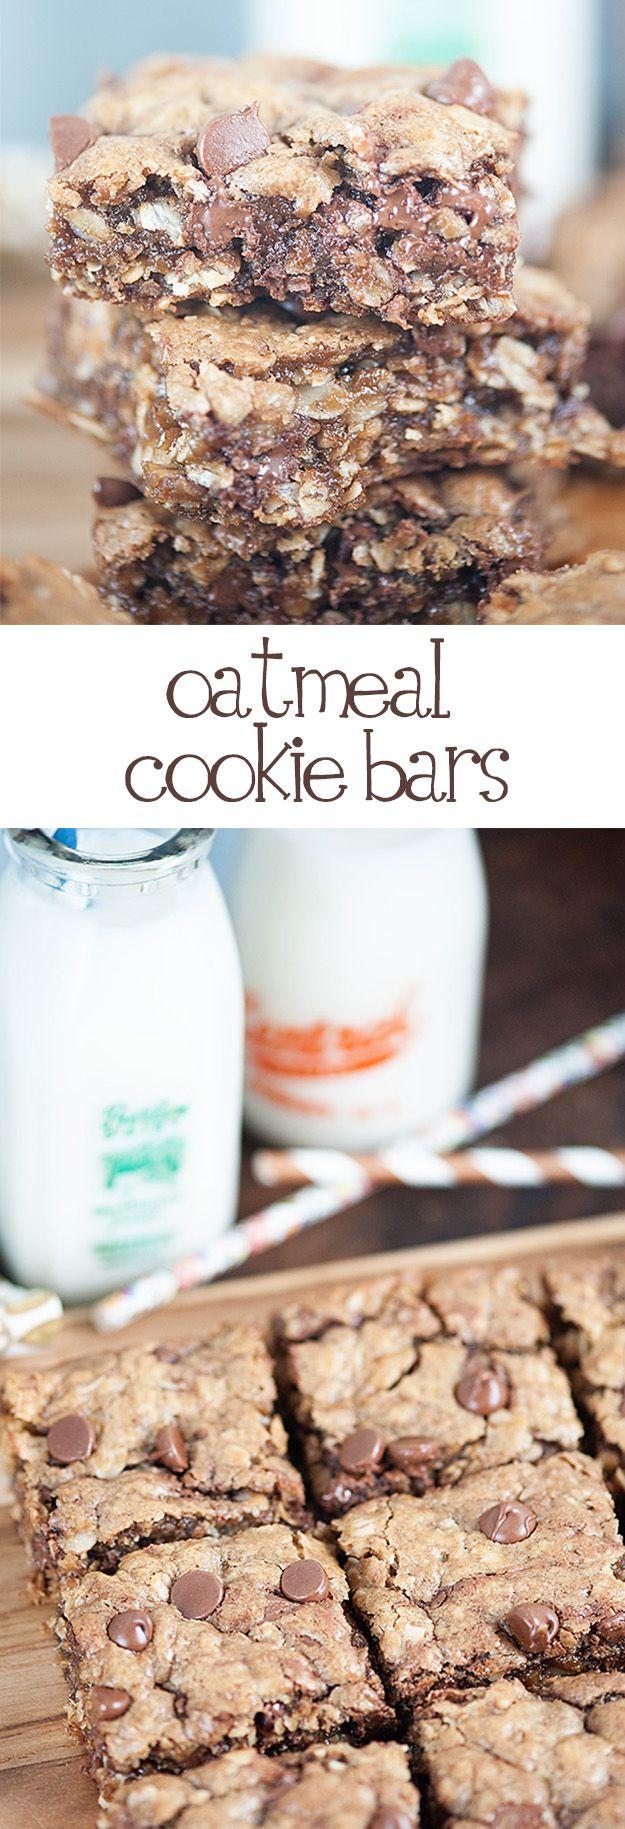 Oatmeal Cookie Bars // galletas de avena